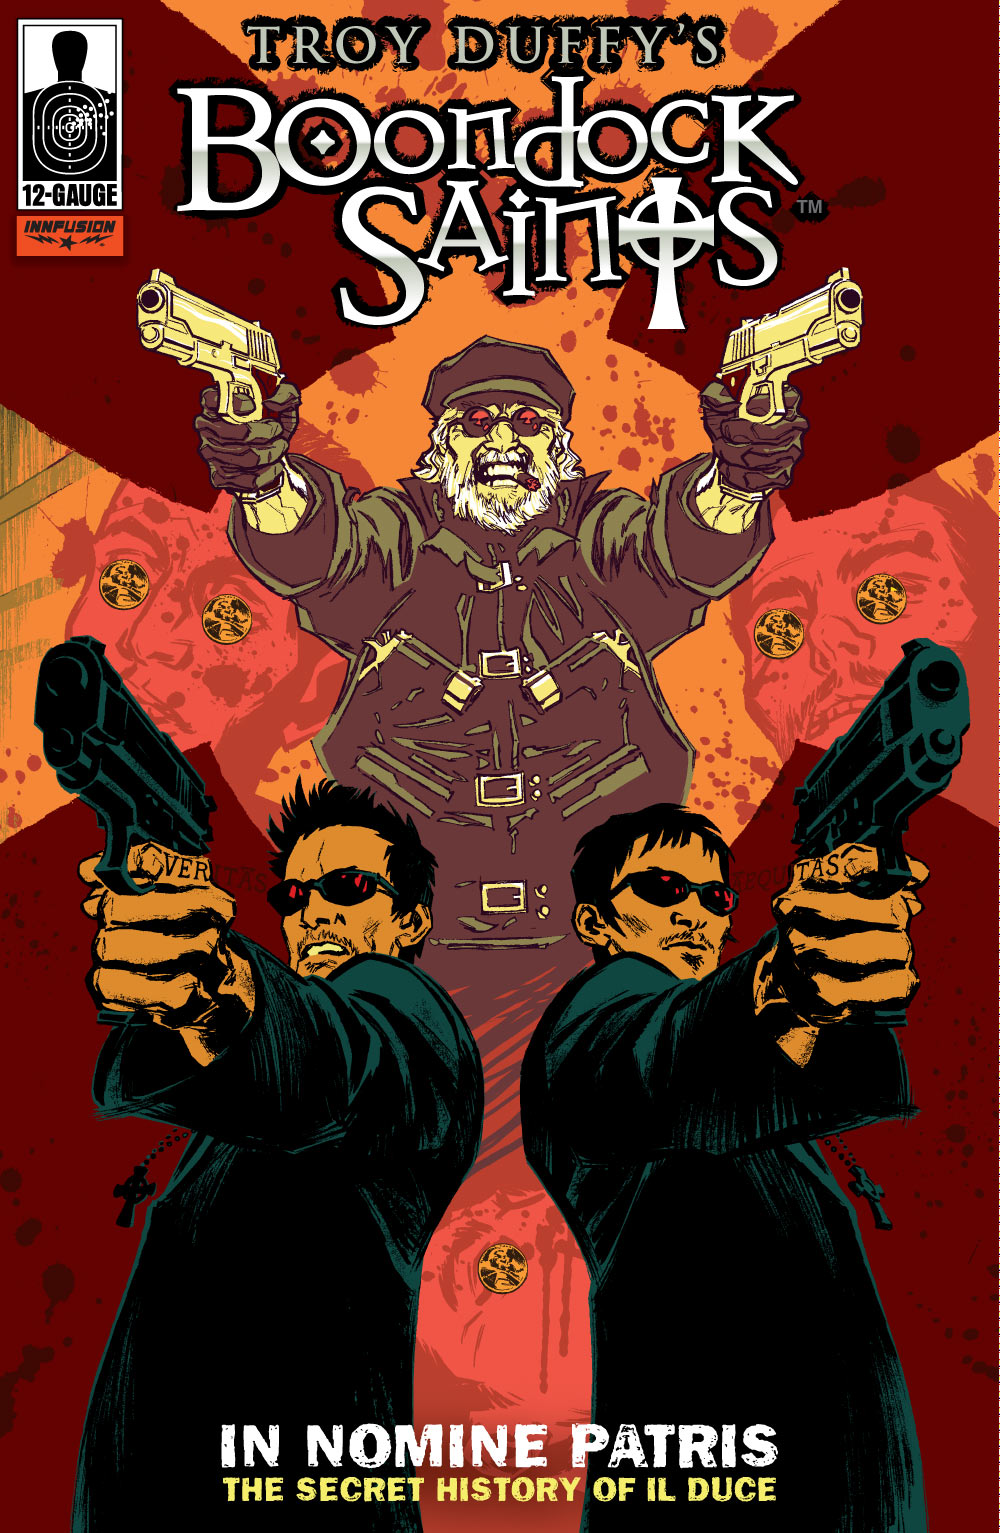 Boondock Saints #1